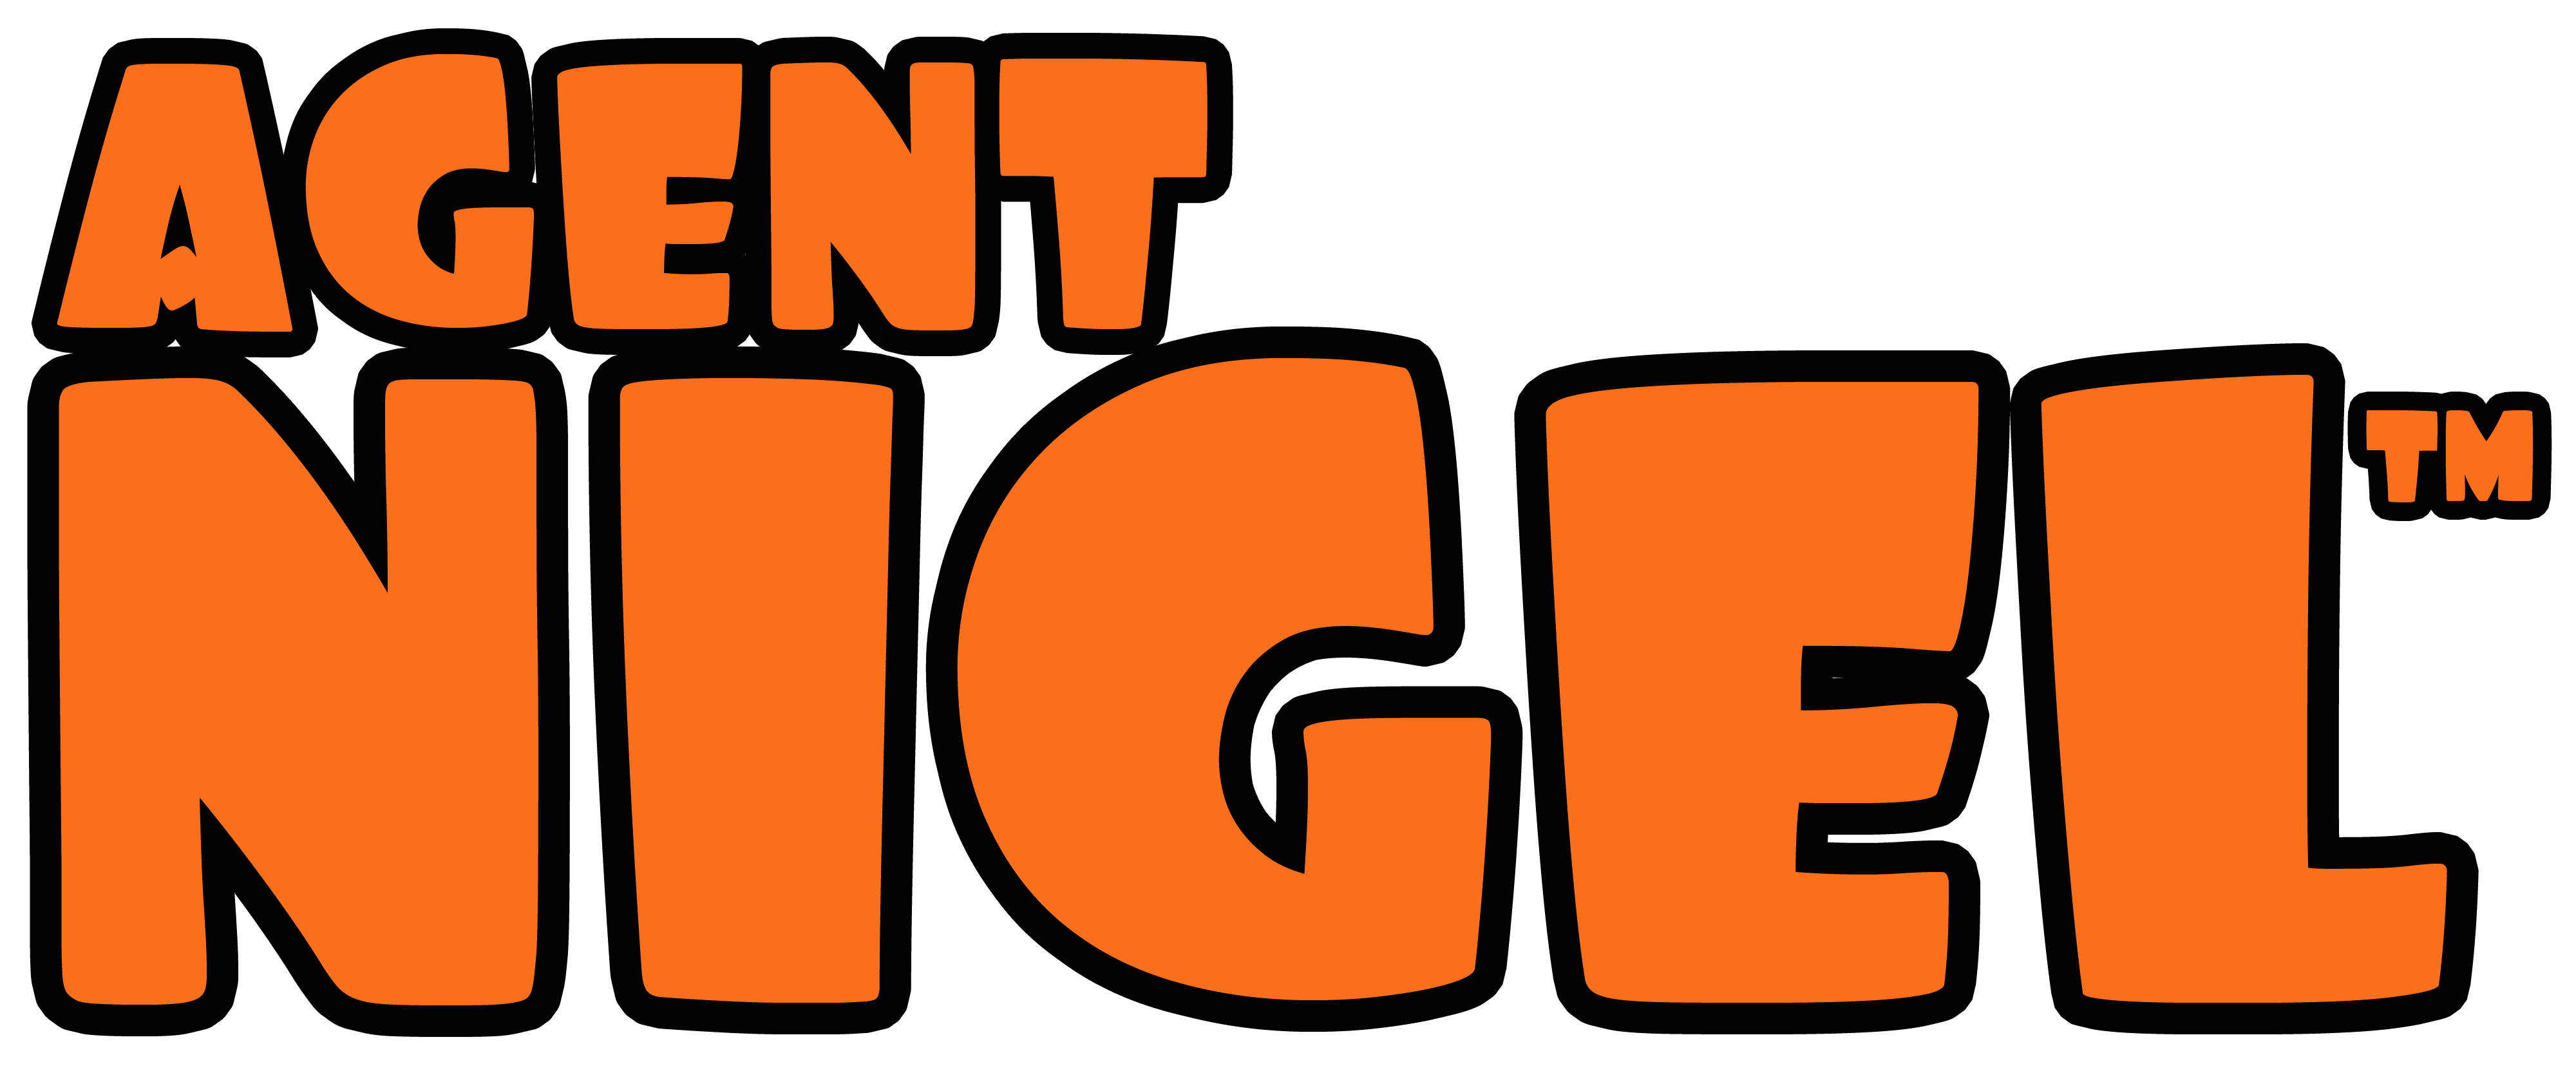 Secret clipart agent orange. Nigel